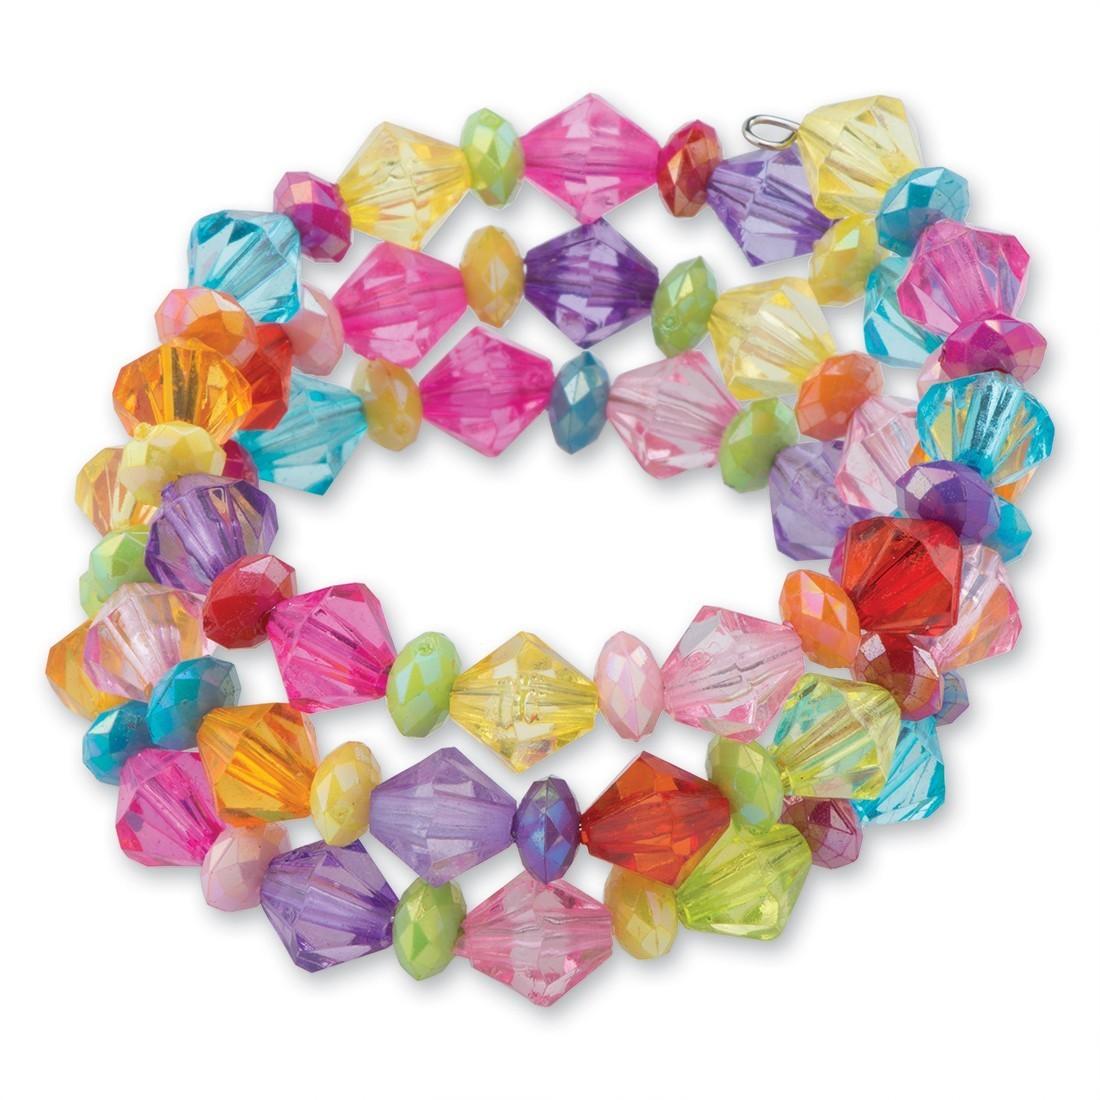 Jewel Coil Bracelets [image]